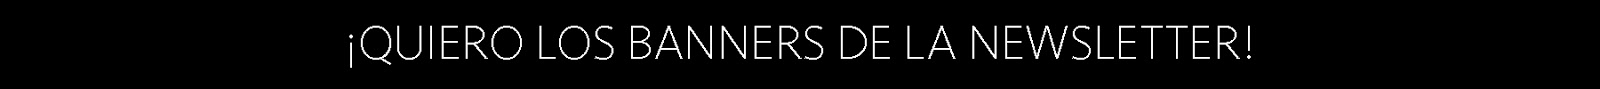 40 banners para tu Newsletter gratuitos